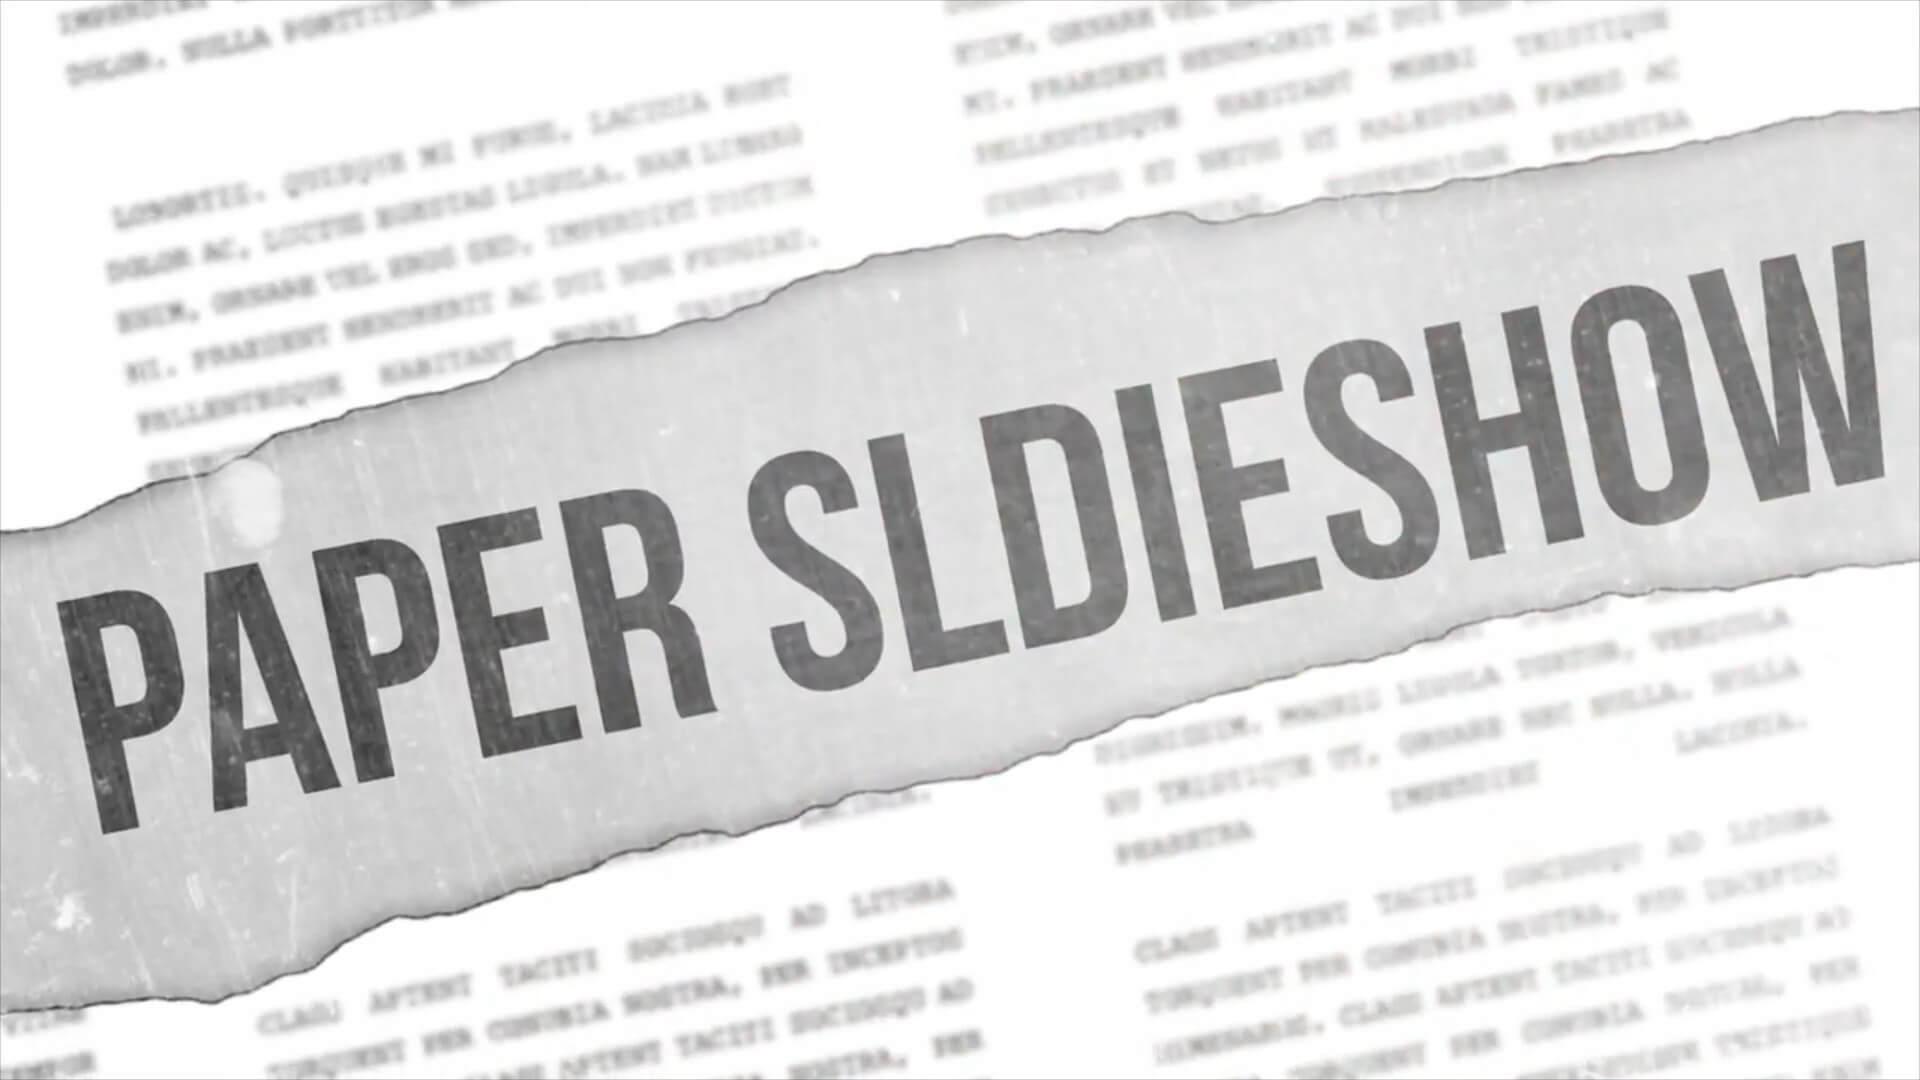 fcpx主题插件 时尚杂志报纸撕纸效果片头模板 Paper Slideshow